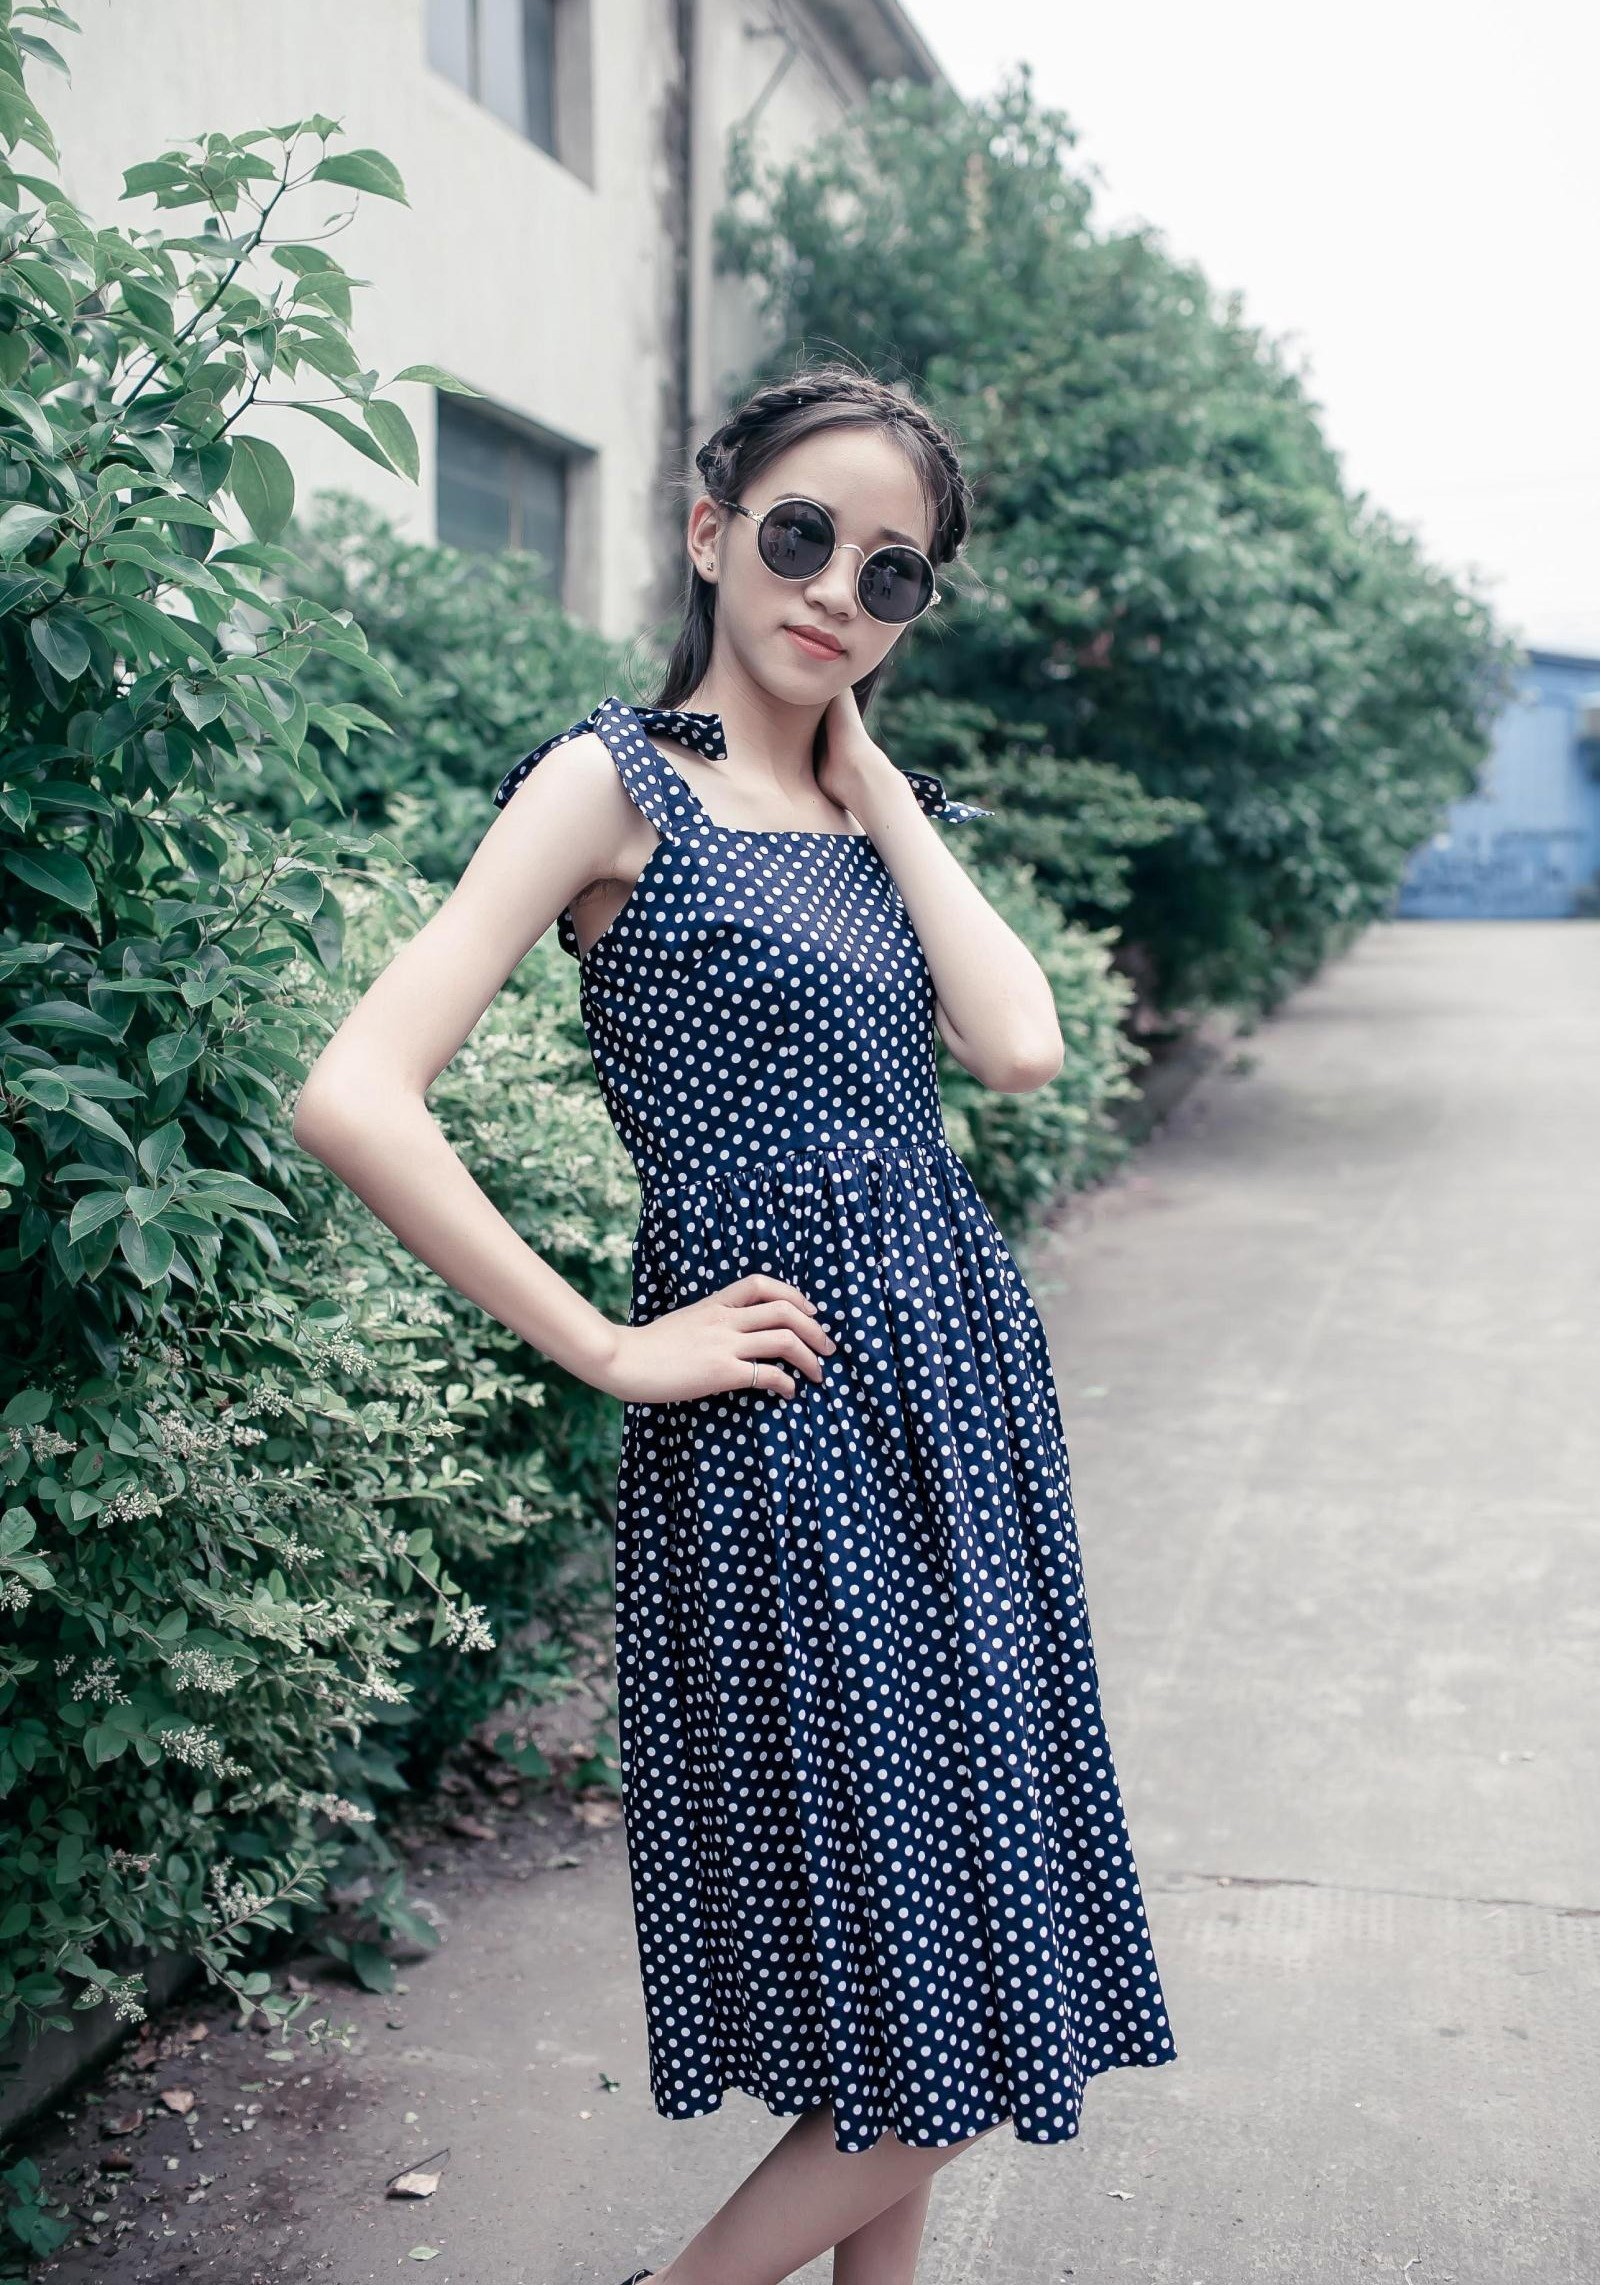 Square cut neck line polka dot dress